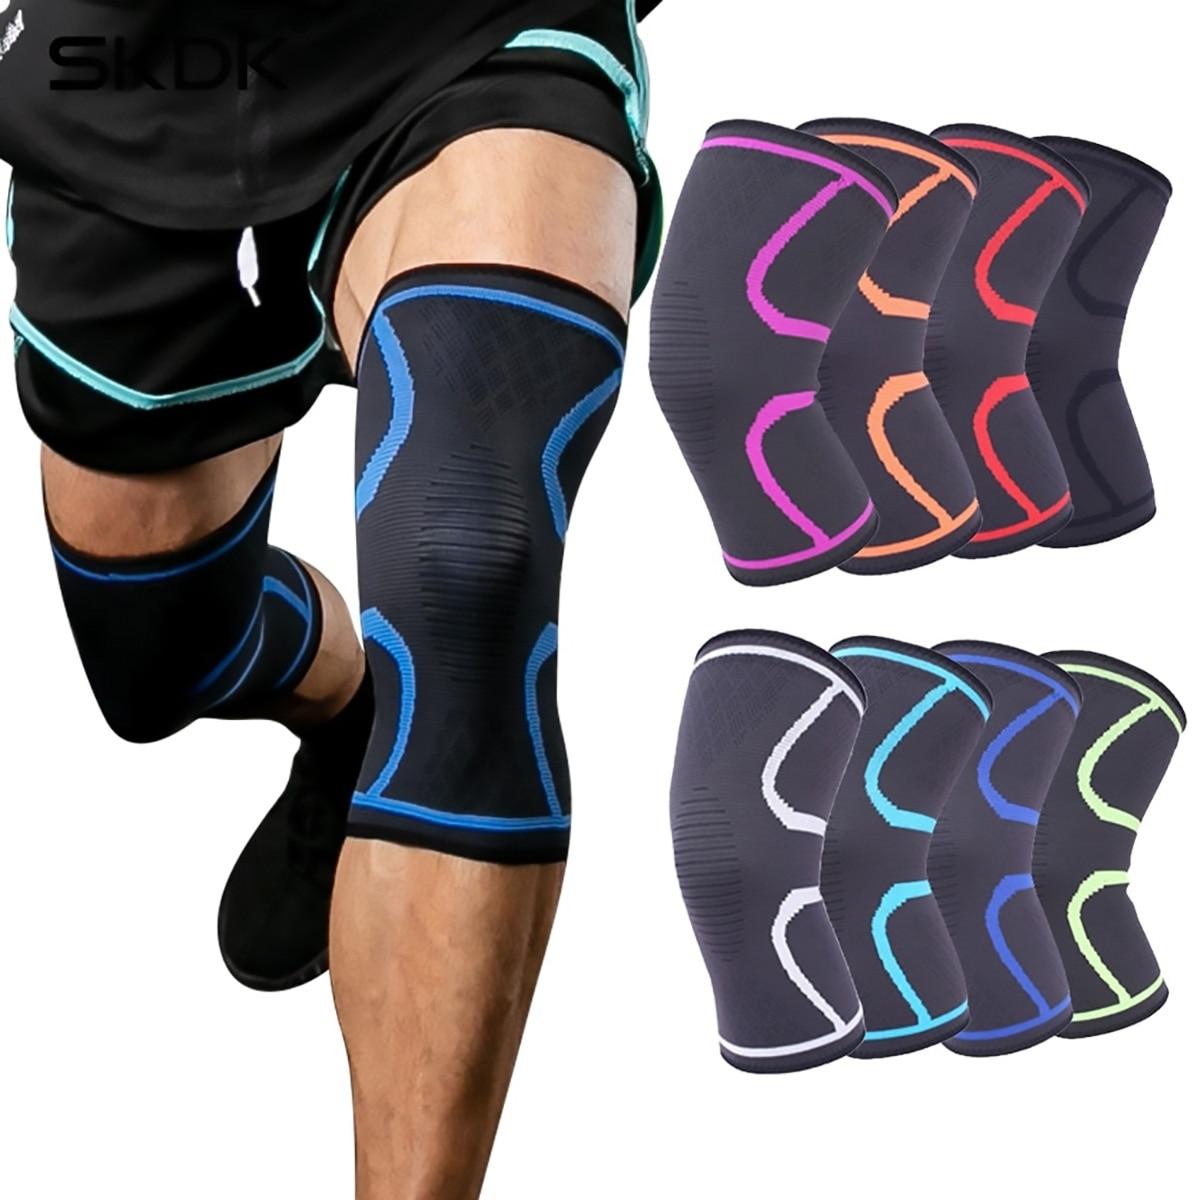 1 rodillera deportiva de nailon elástico para baloncesto, voleibol, Fitness, Running, artritis y músculo